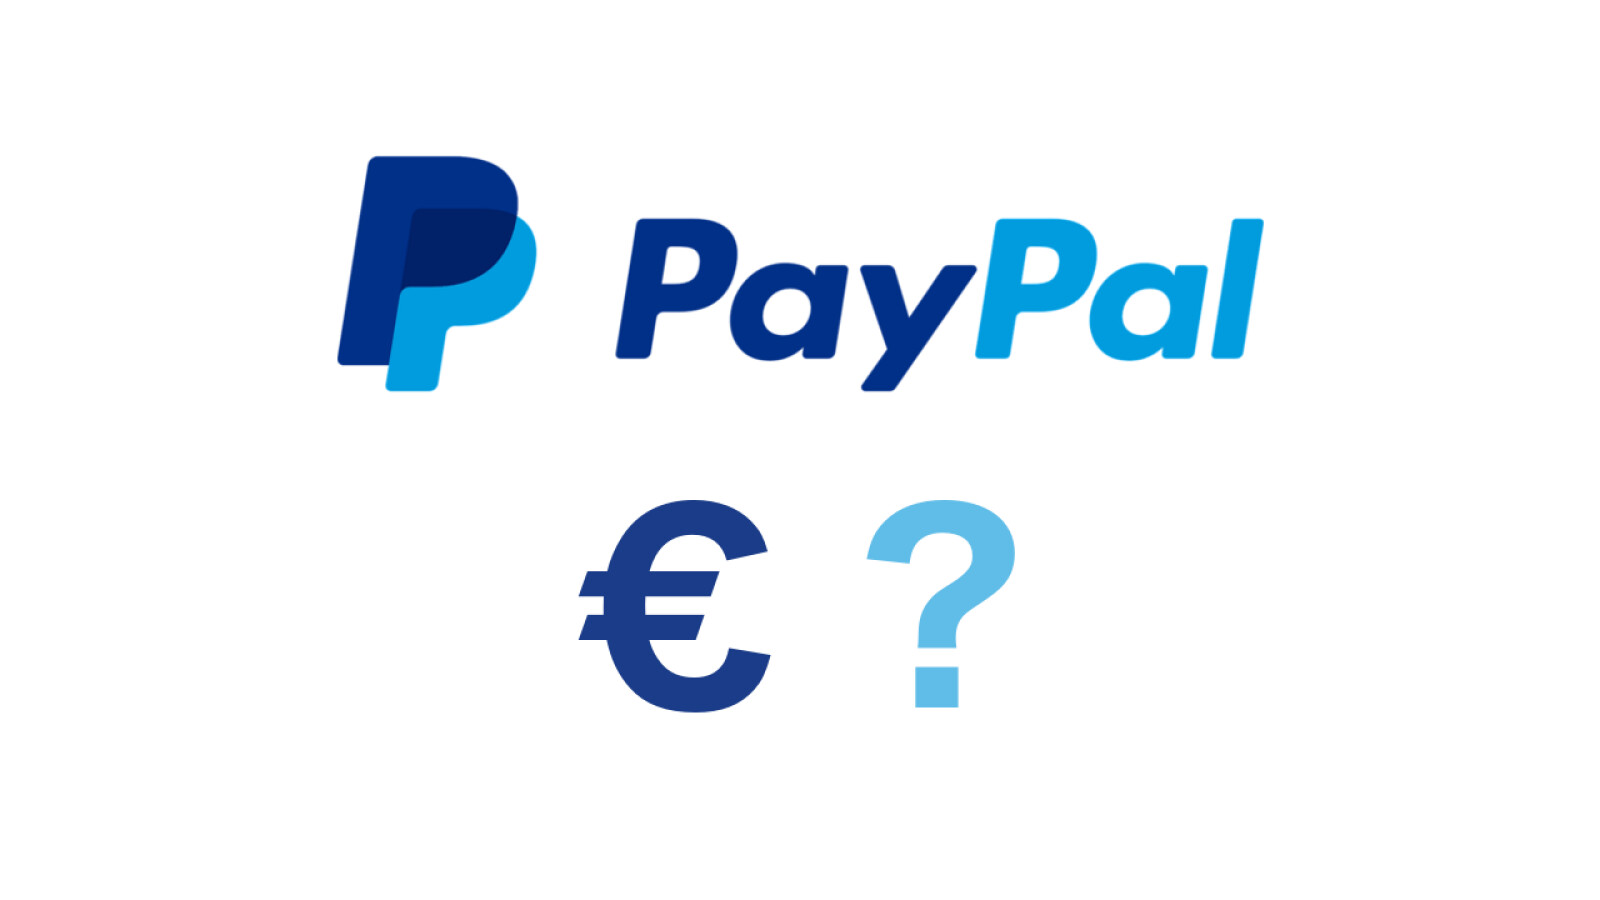 Paypal Betrugsmasche Käufer